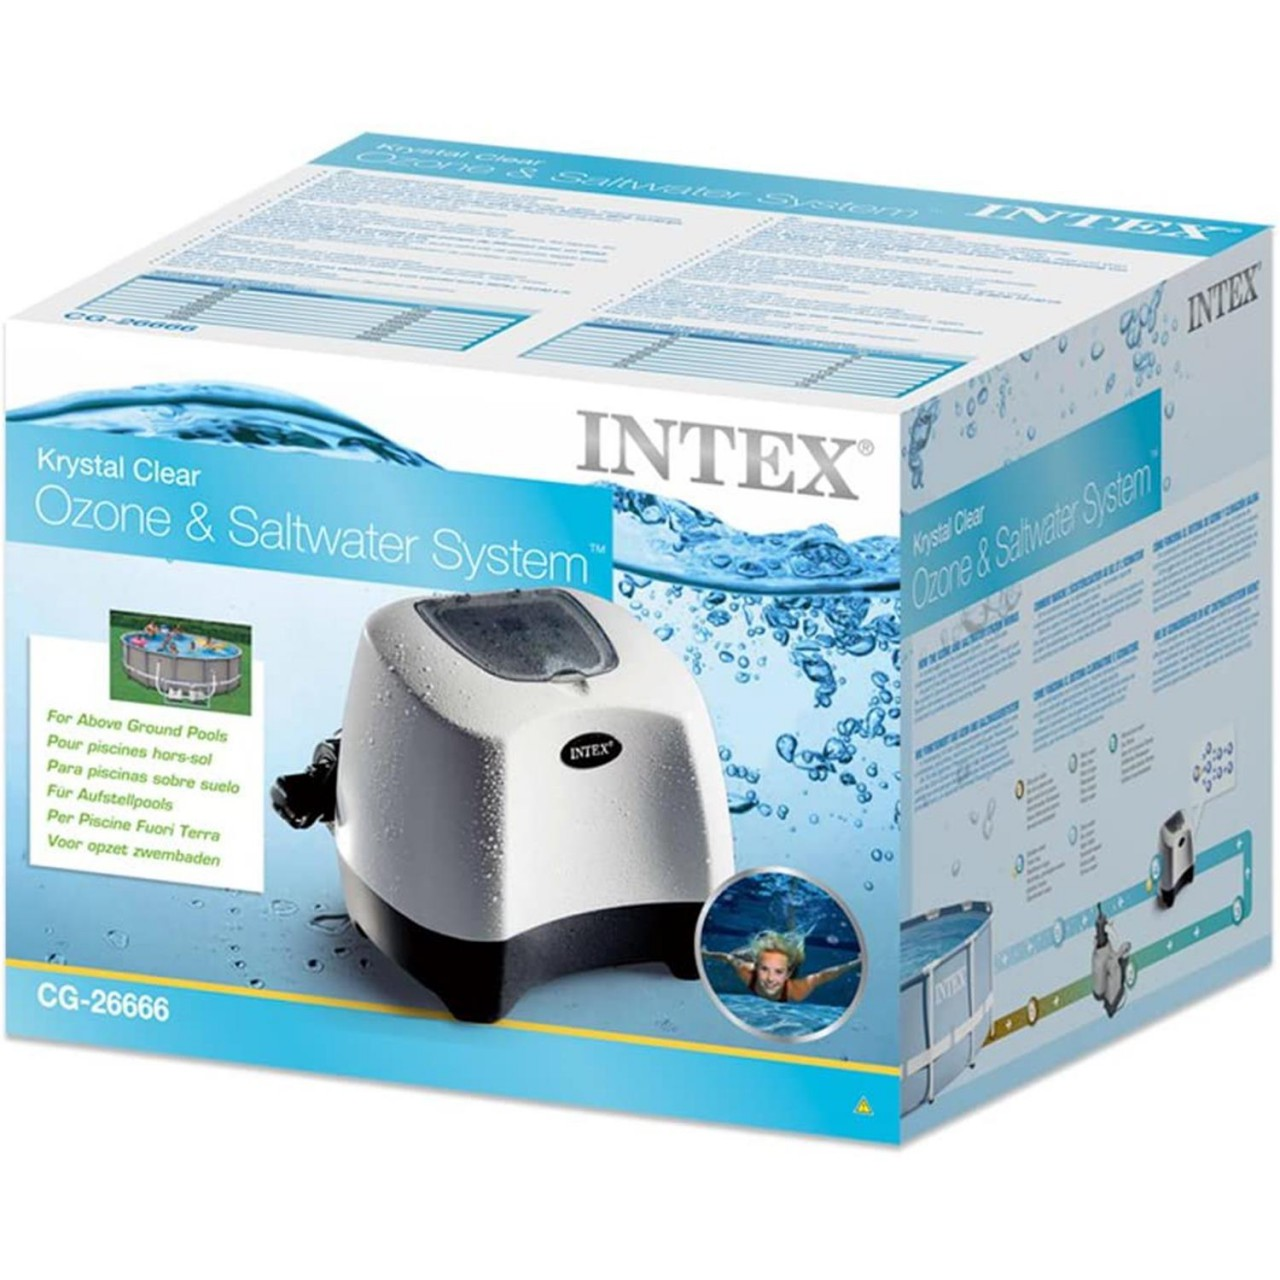 Intex 26666 Ozon Generator Chlorinator Salzwassersystem Salzwasseranlage Pumpe